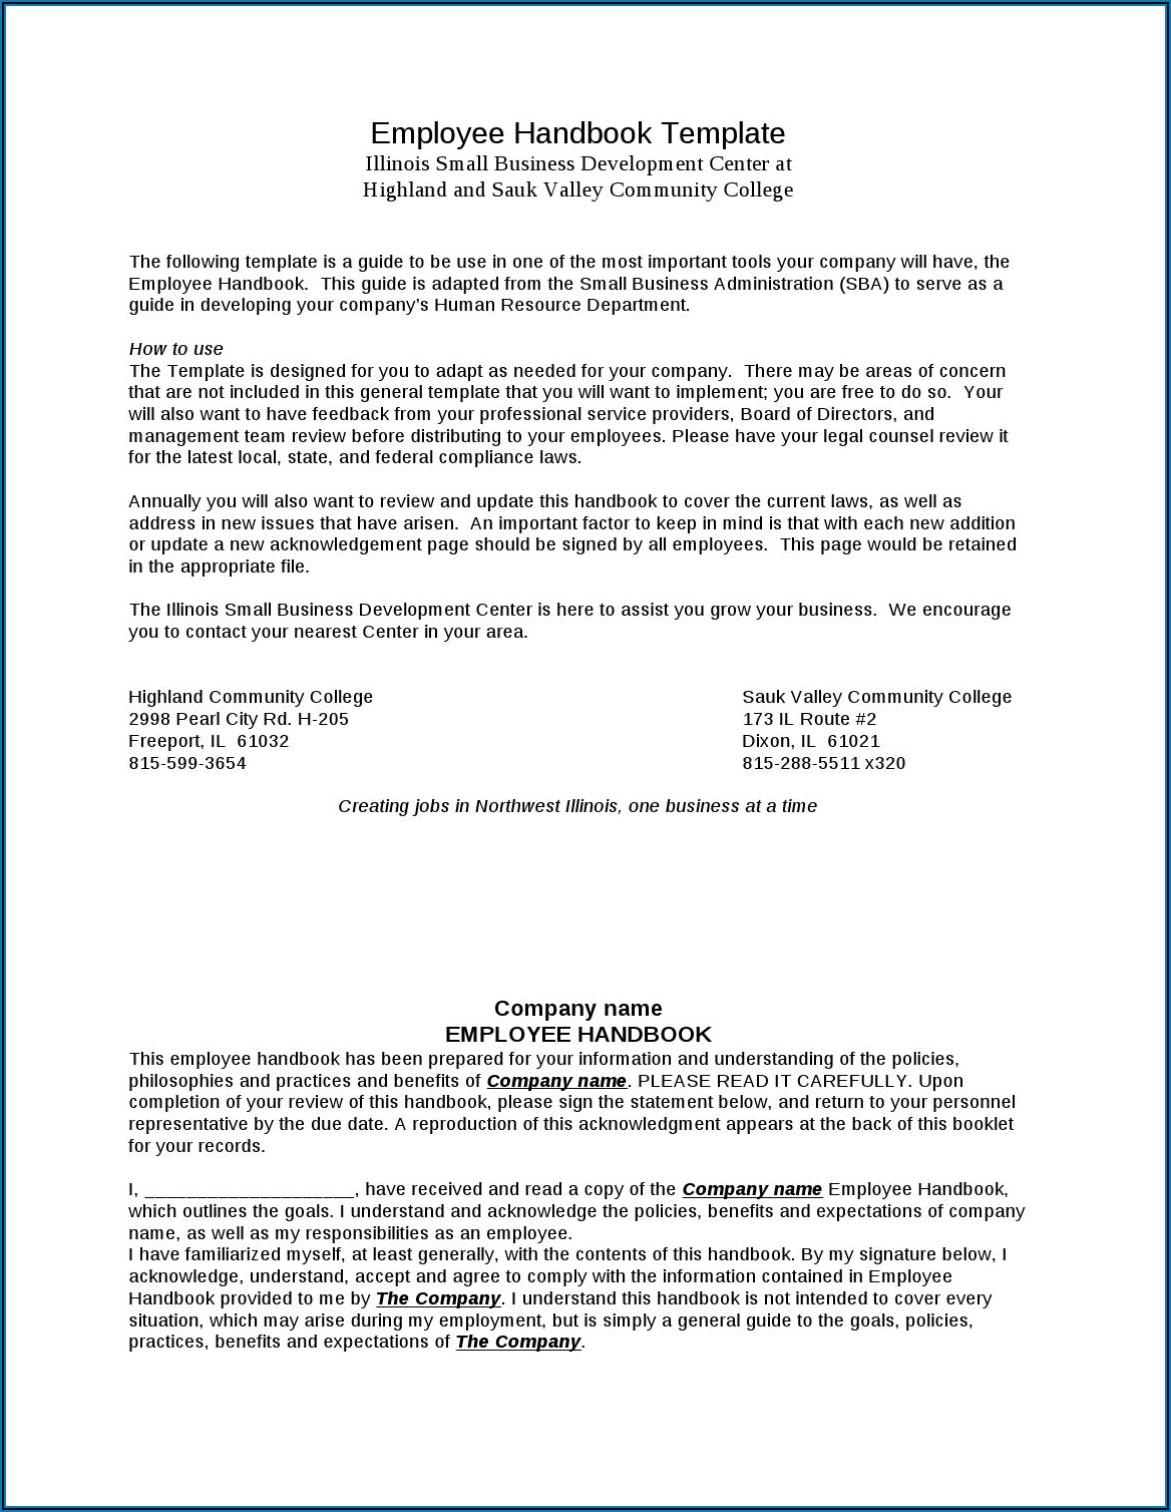 Employee Handbook Sample For Small Business